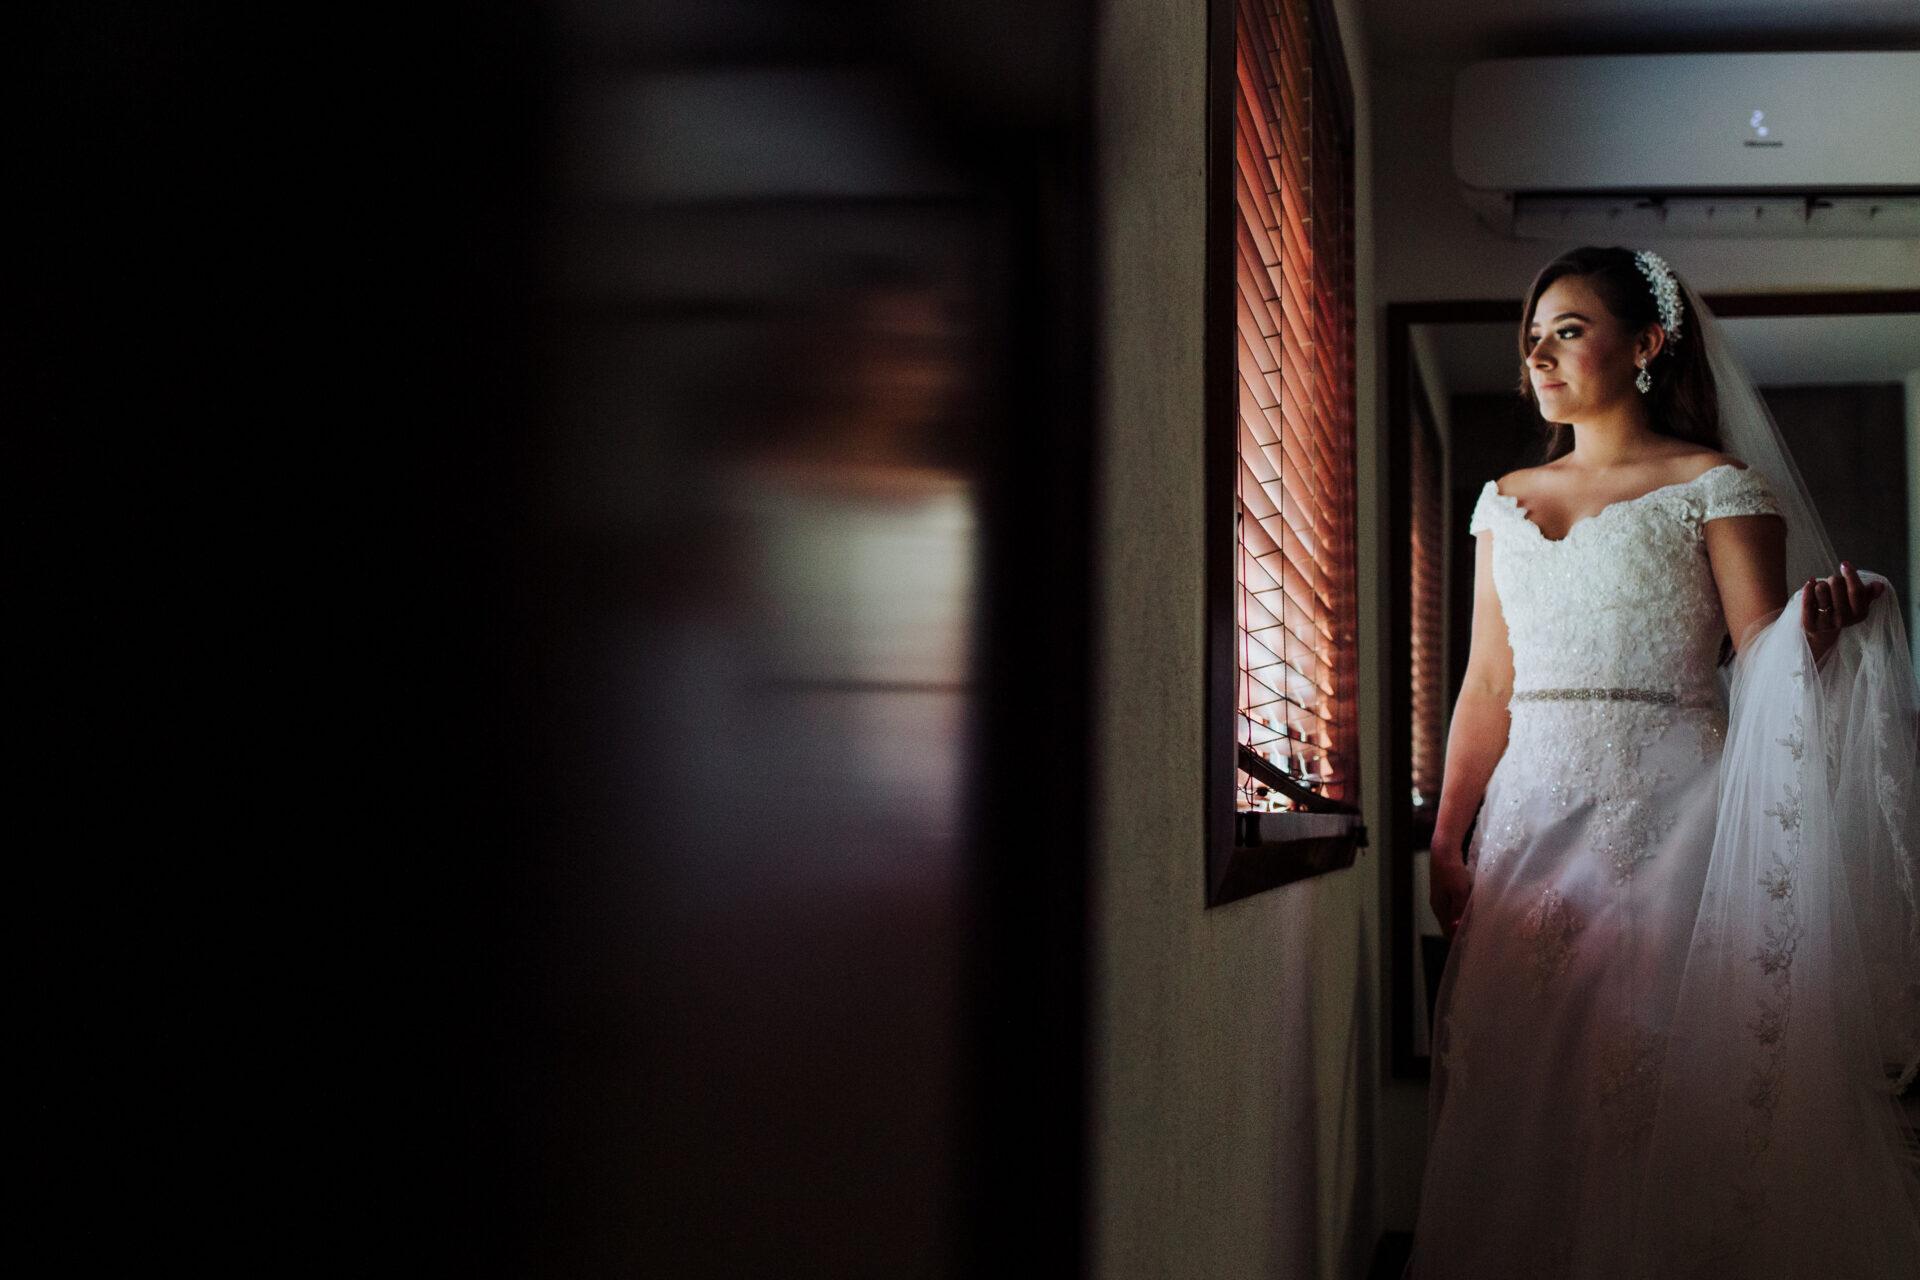 javier_noriega_fotografo_bodas_torreon_coahuila_zacatecas_wedding_photographer18a